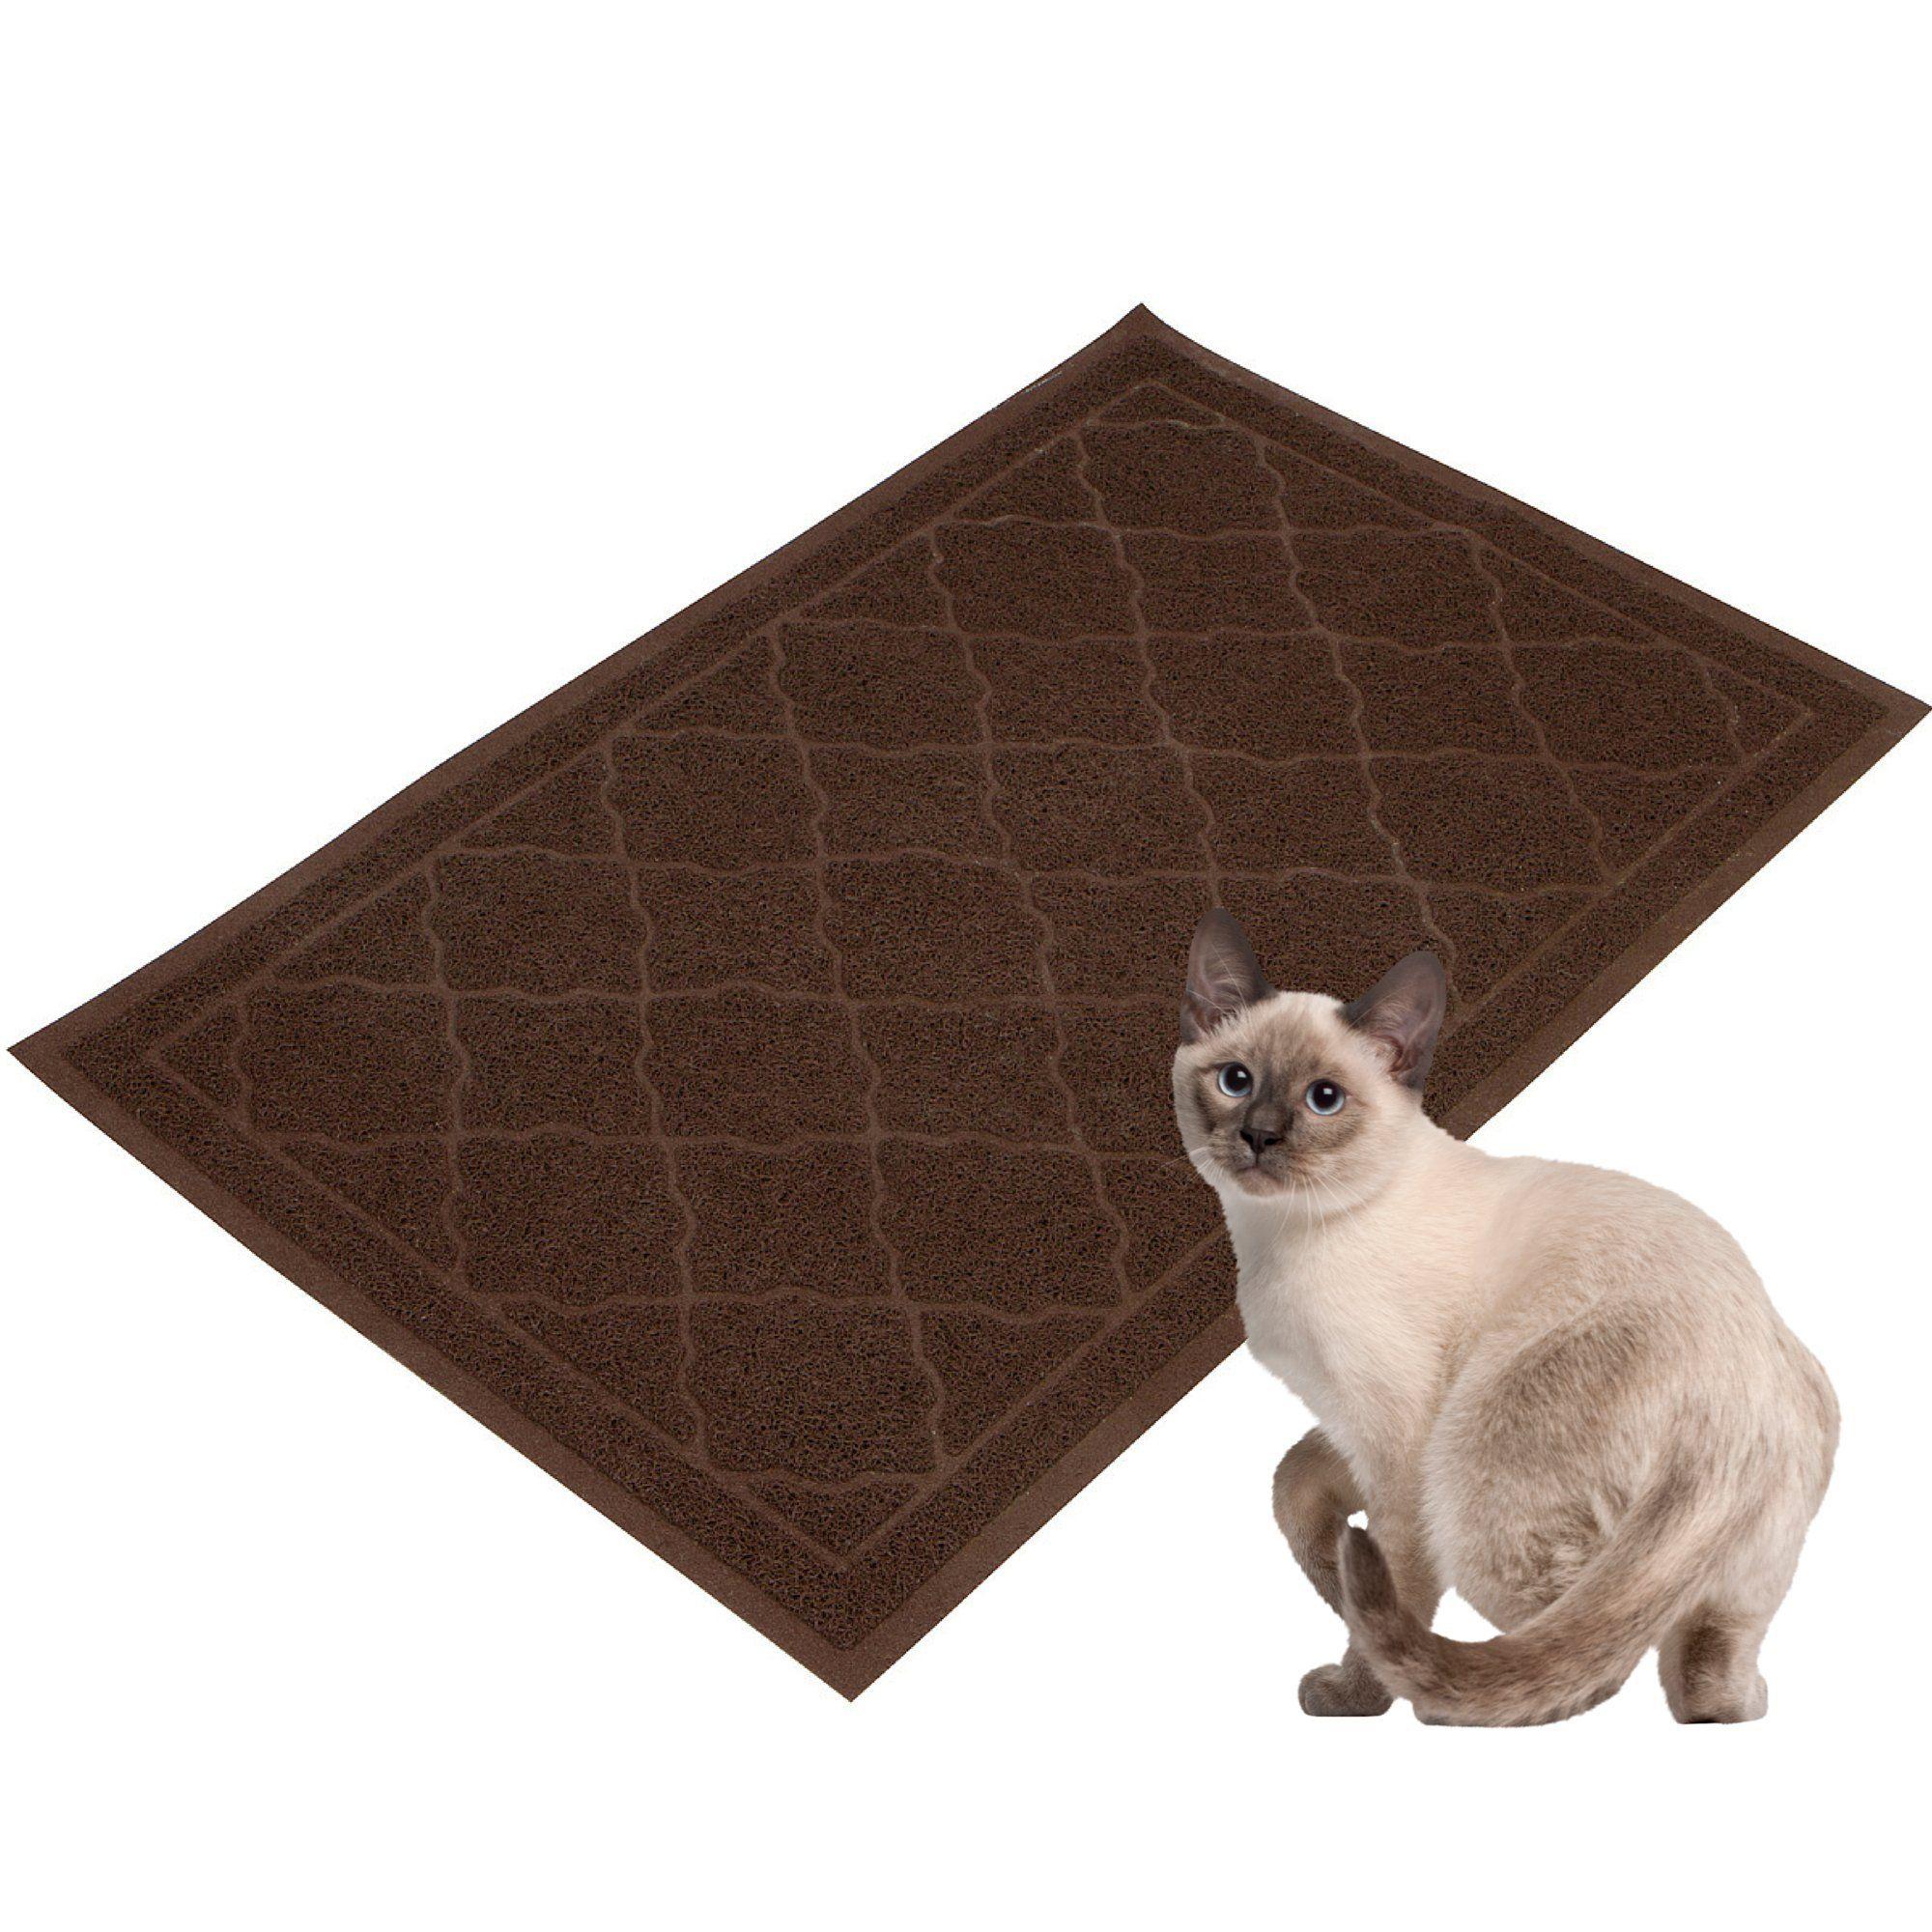 center catcher petcostore petmate cat en shop petco product mats litter mat grid